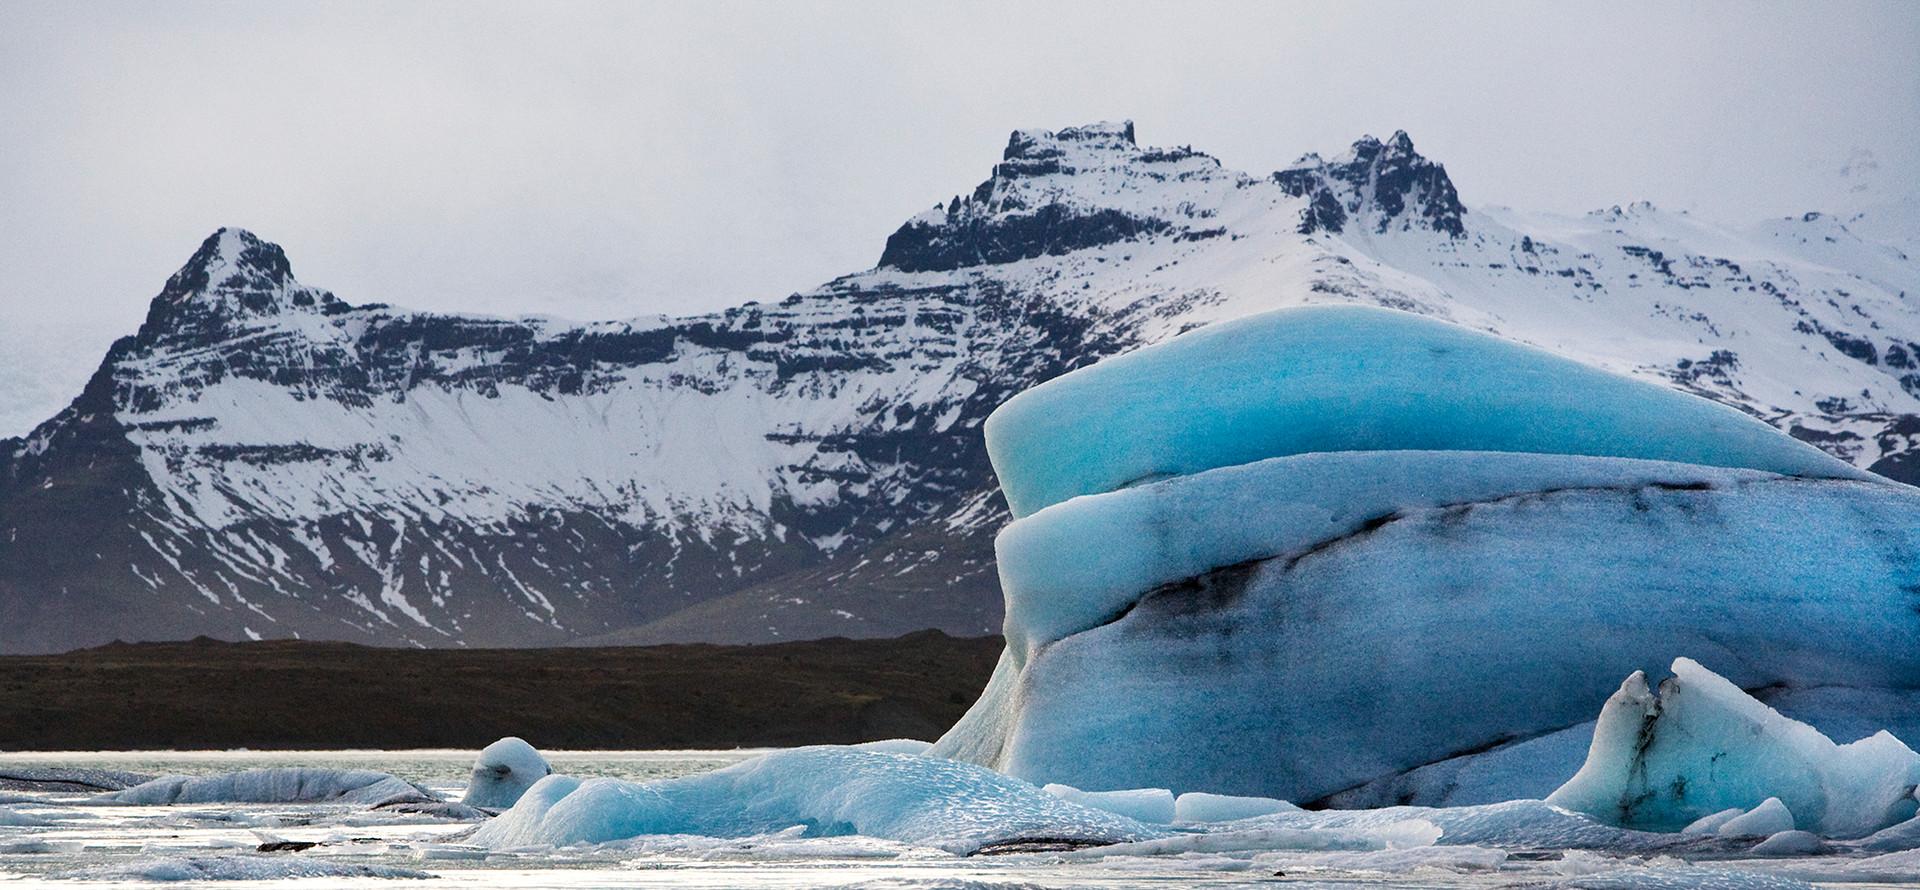 Iceberg, Jokusarlon